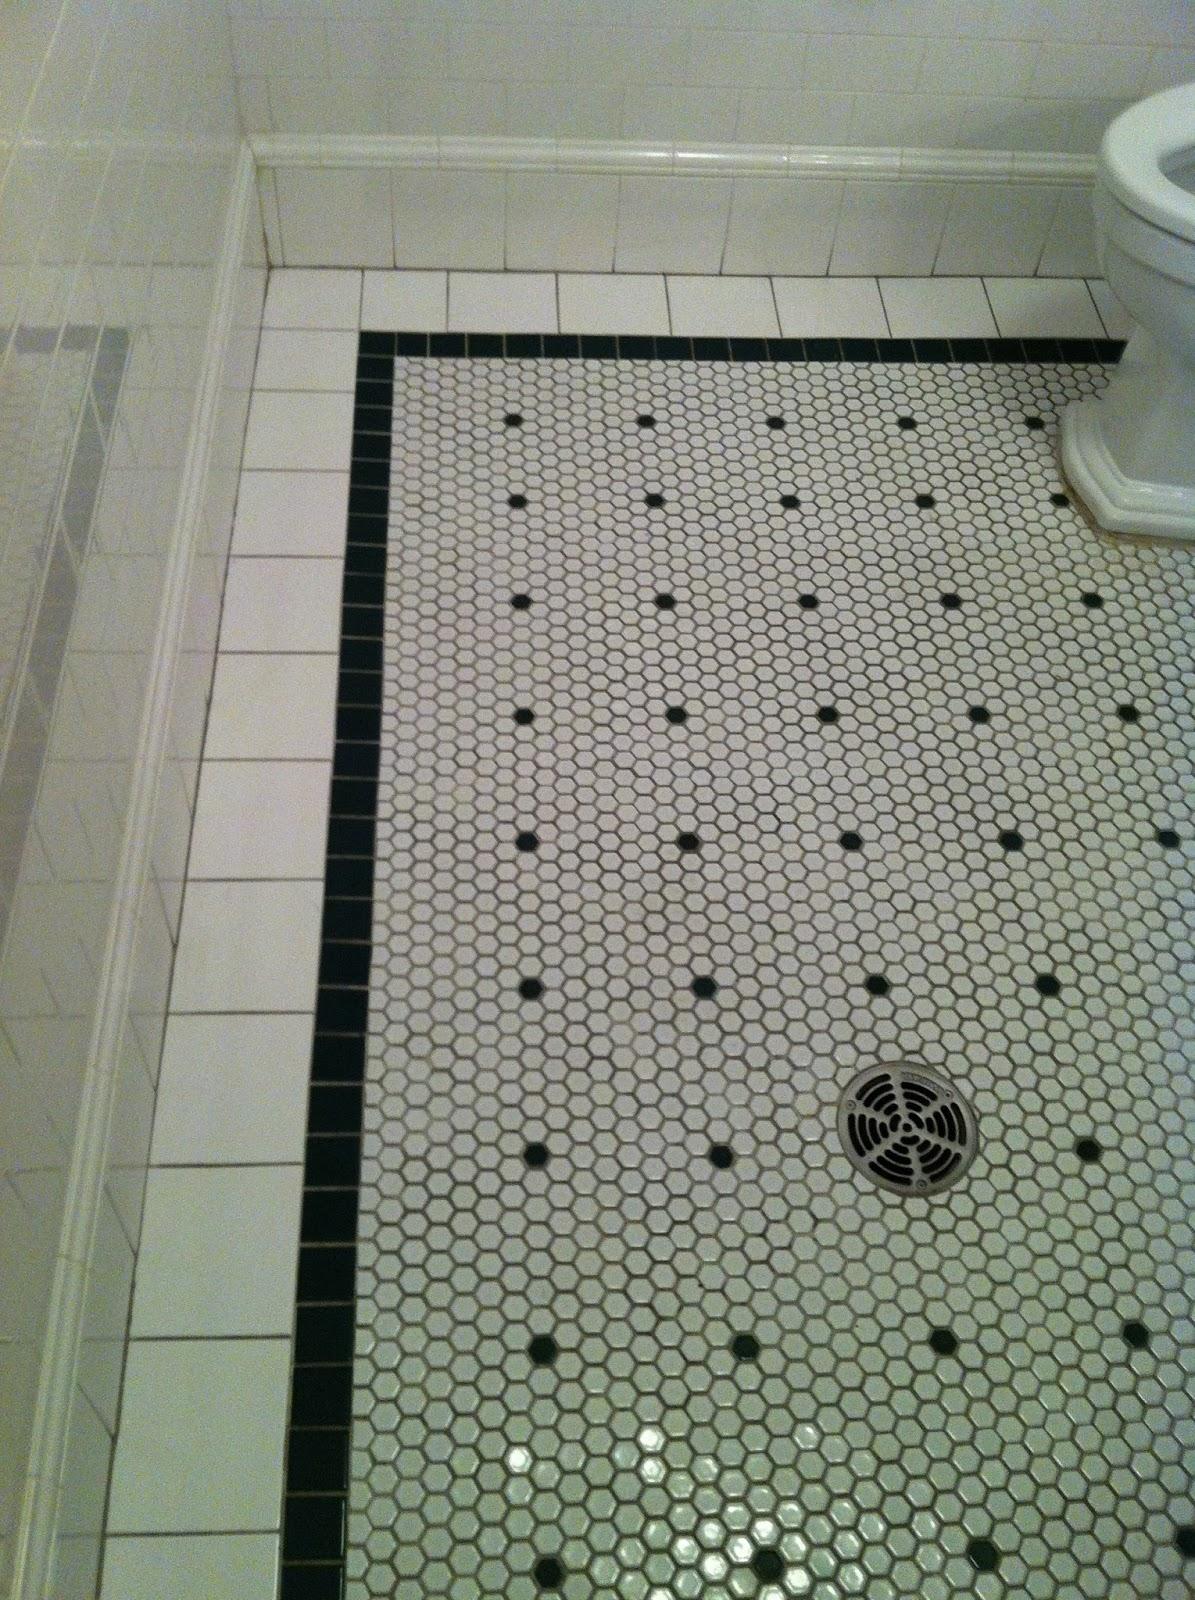 Black And White Bathroom Floor Ideas  bathroom stalker park city  restaurant  design dump bathroom stalker park city restaurant. Classic Black And White Bathroom Floor Tile